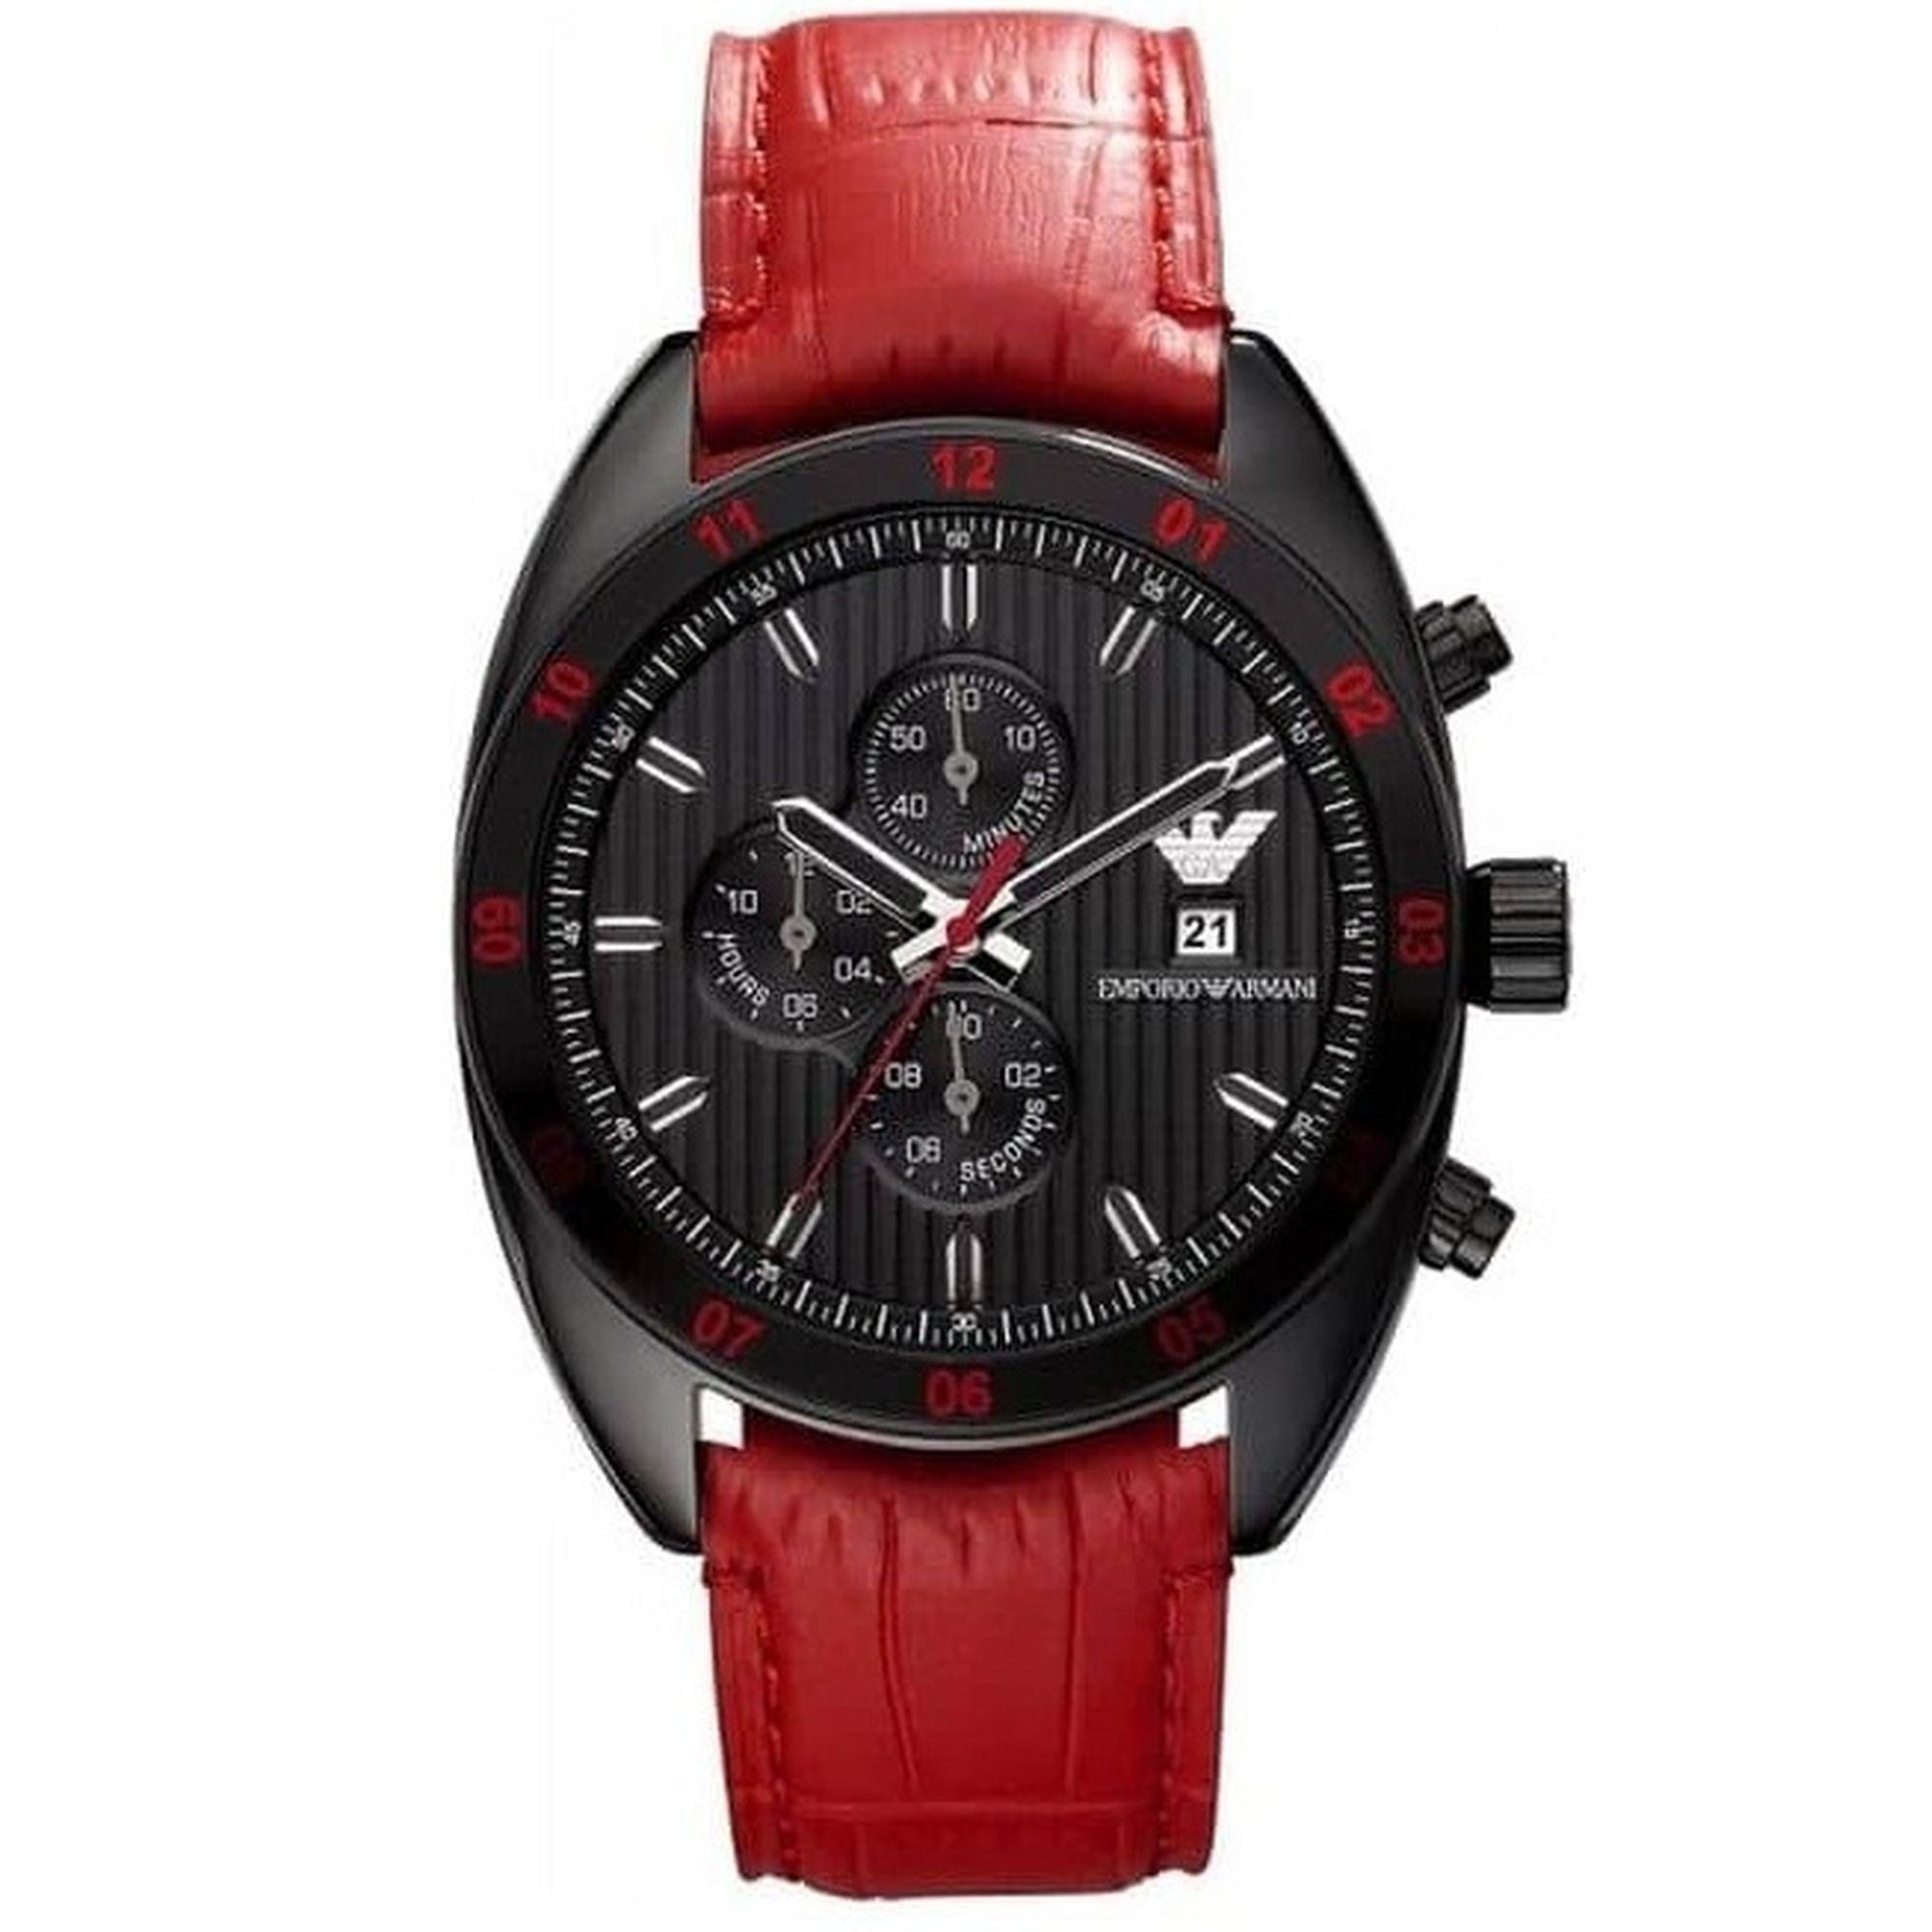 Emporio Armani με Μαύρο Καντράν και Κόκκινο Λουράκι AR5918, ρολόι, ρολόγια, Emporio Armani, Ανδρικό ρολόι, Δωρεάν μεταφορικά